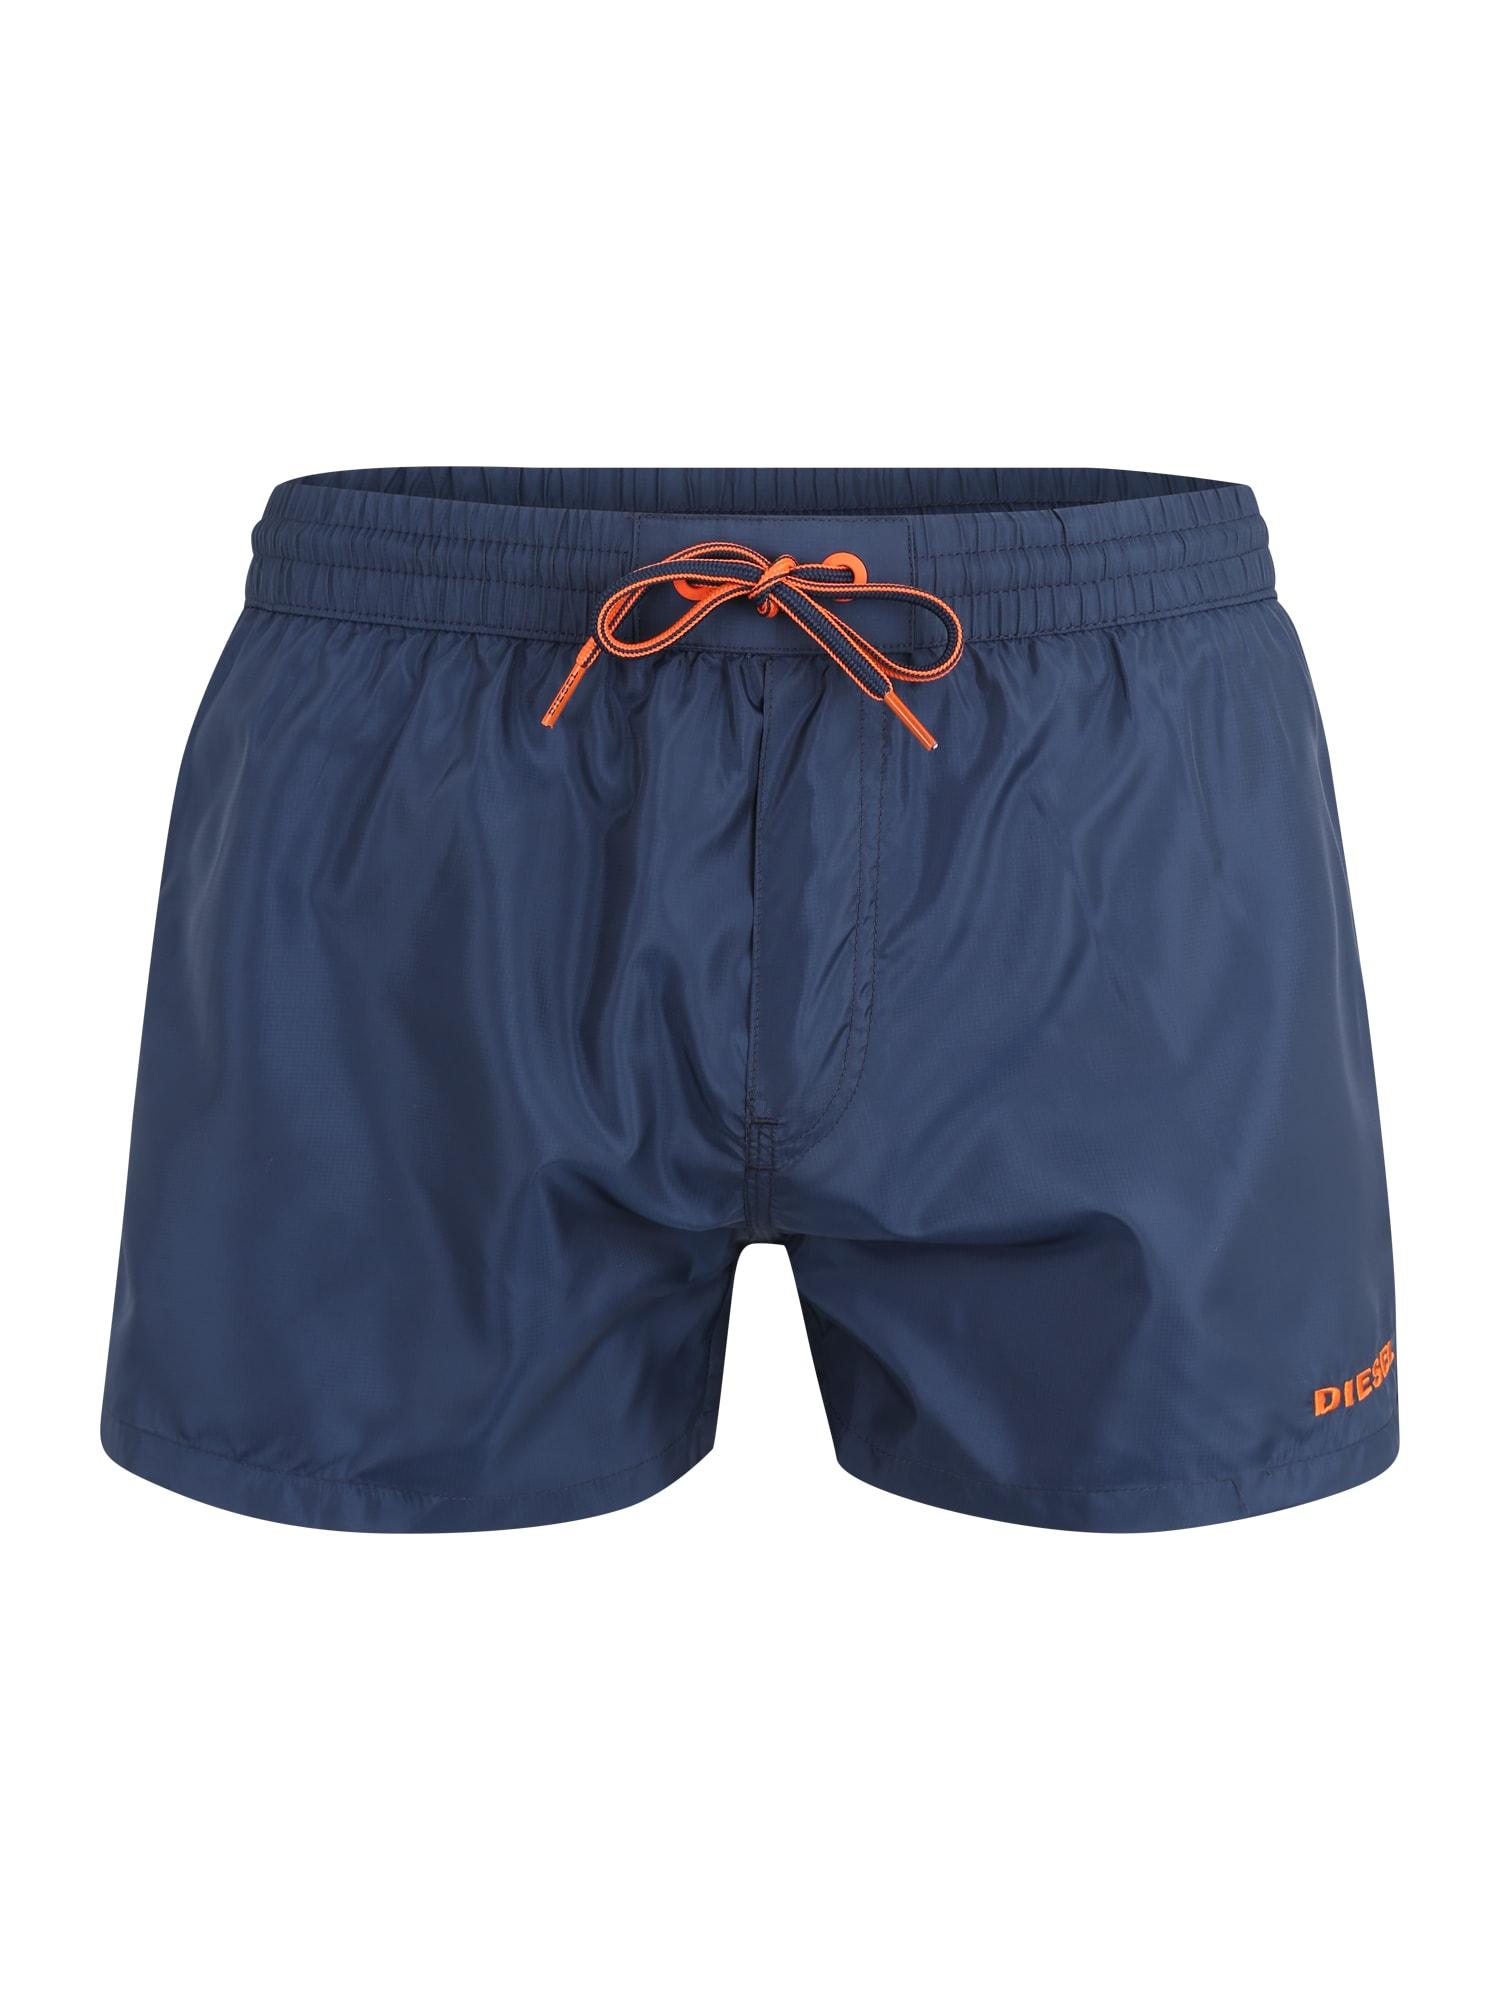 Plavecké šortky SANDY námořnická modř DIESEL